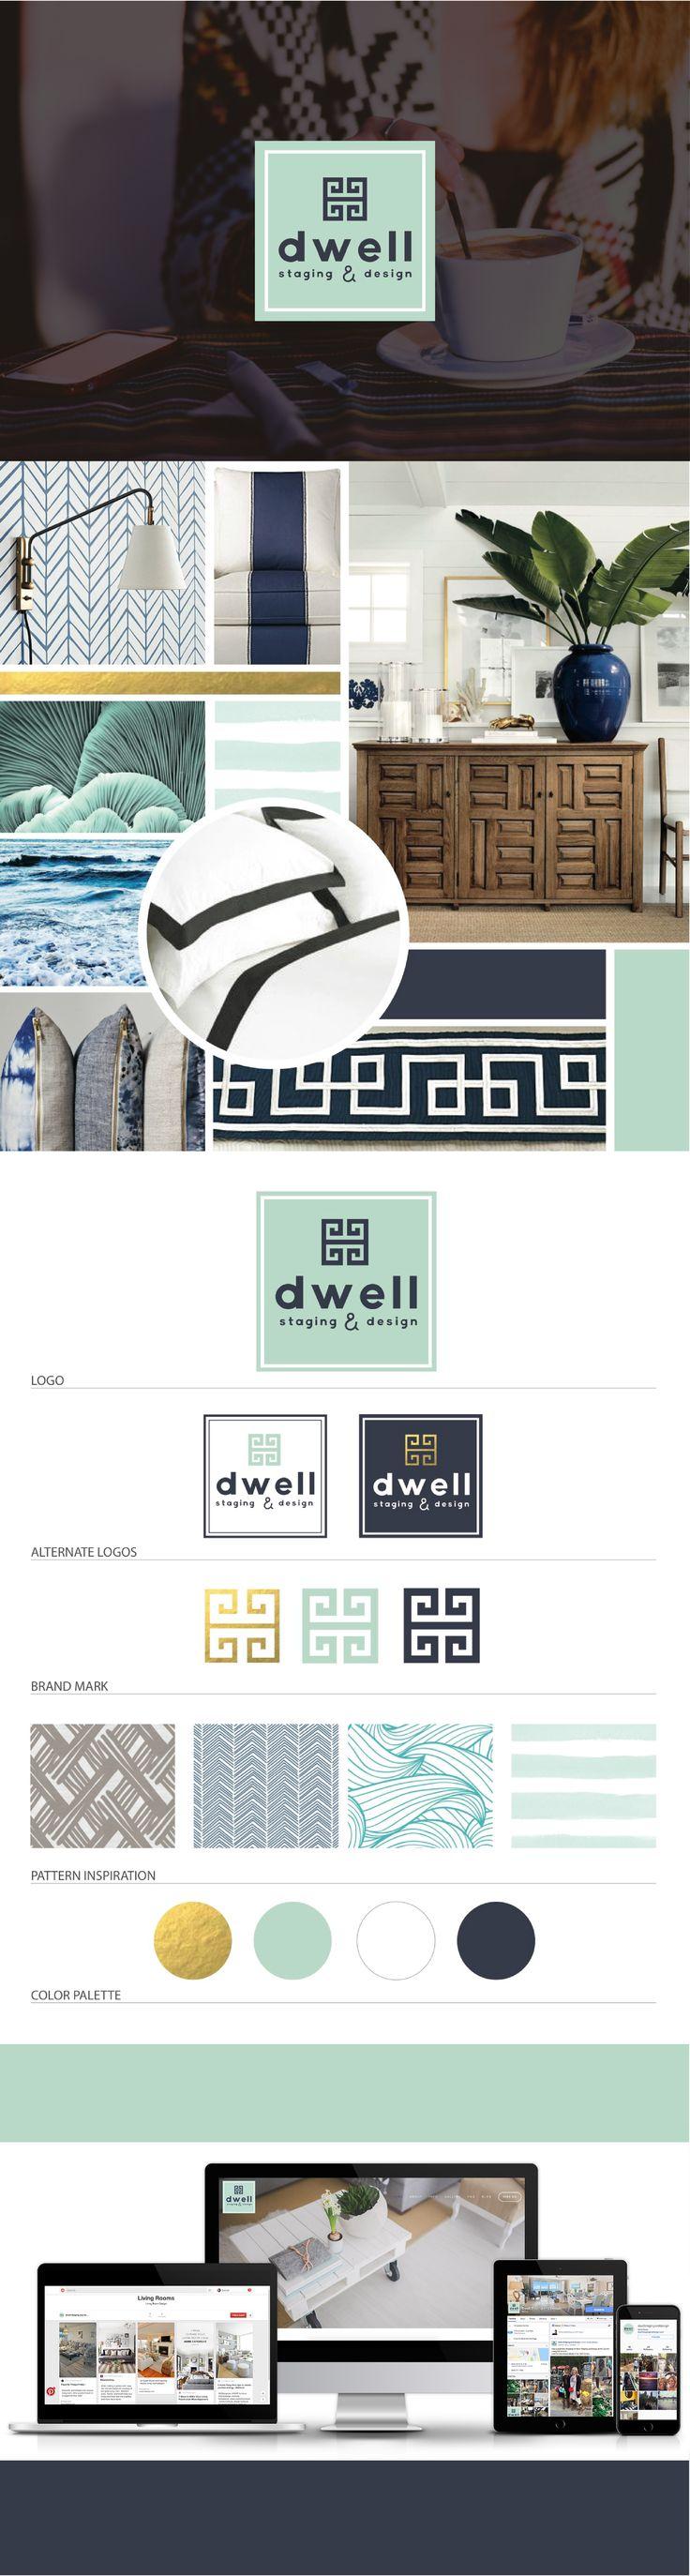 Brand Launch: Dwell Staging & Design - Digital Design Co. | visit: http://www.thedigitaldesignco.com/dwell-client-page to see full mood board, website design, branding guide, logo design, gold foil, logo variations, interior design branding, seafoam green color palette #digitaldesign